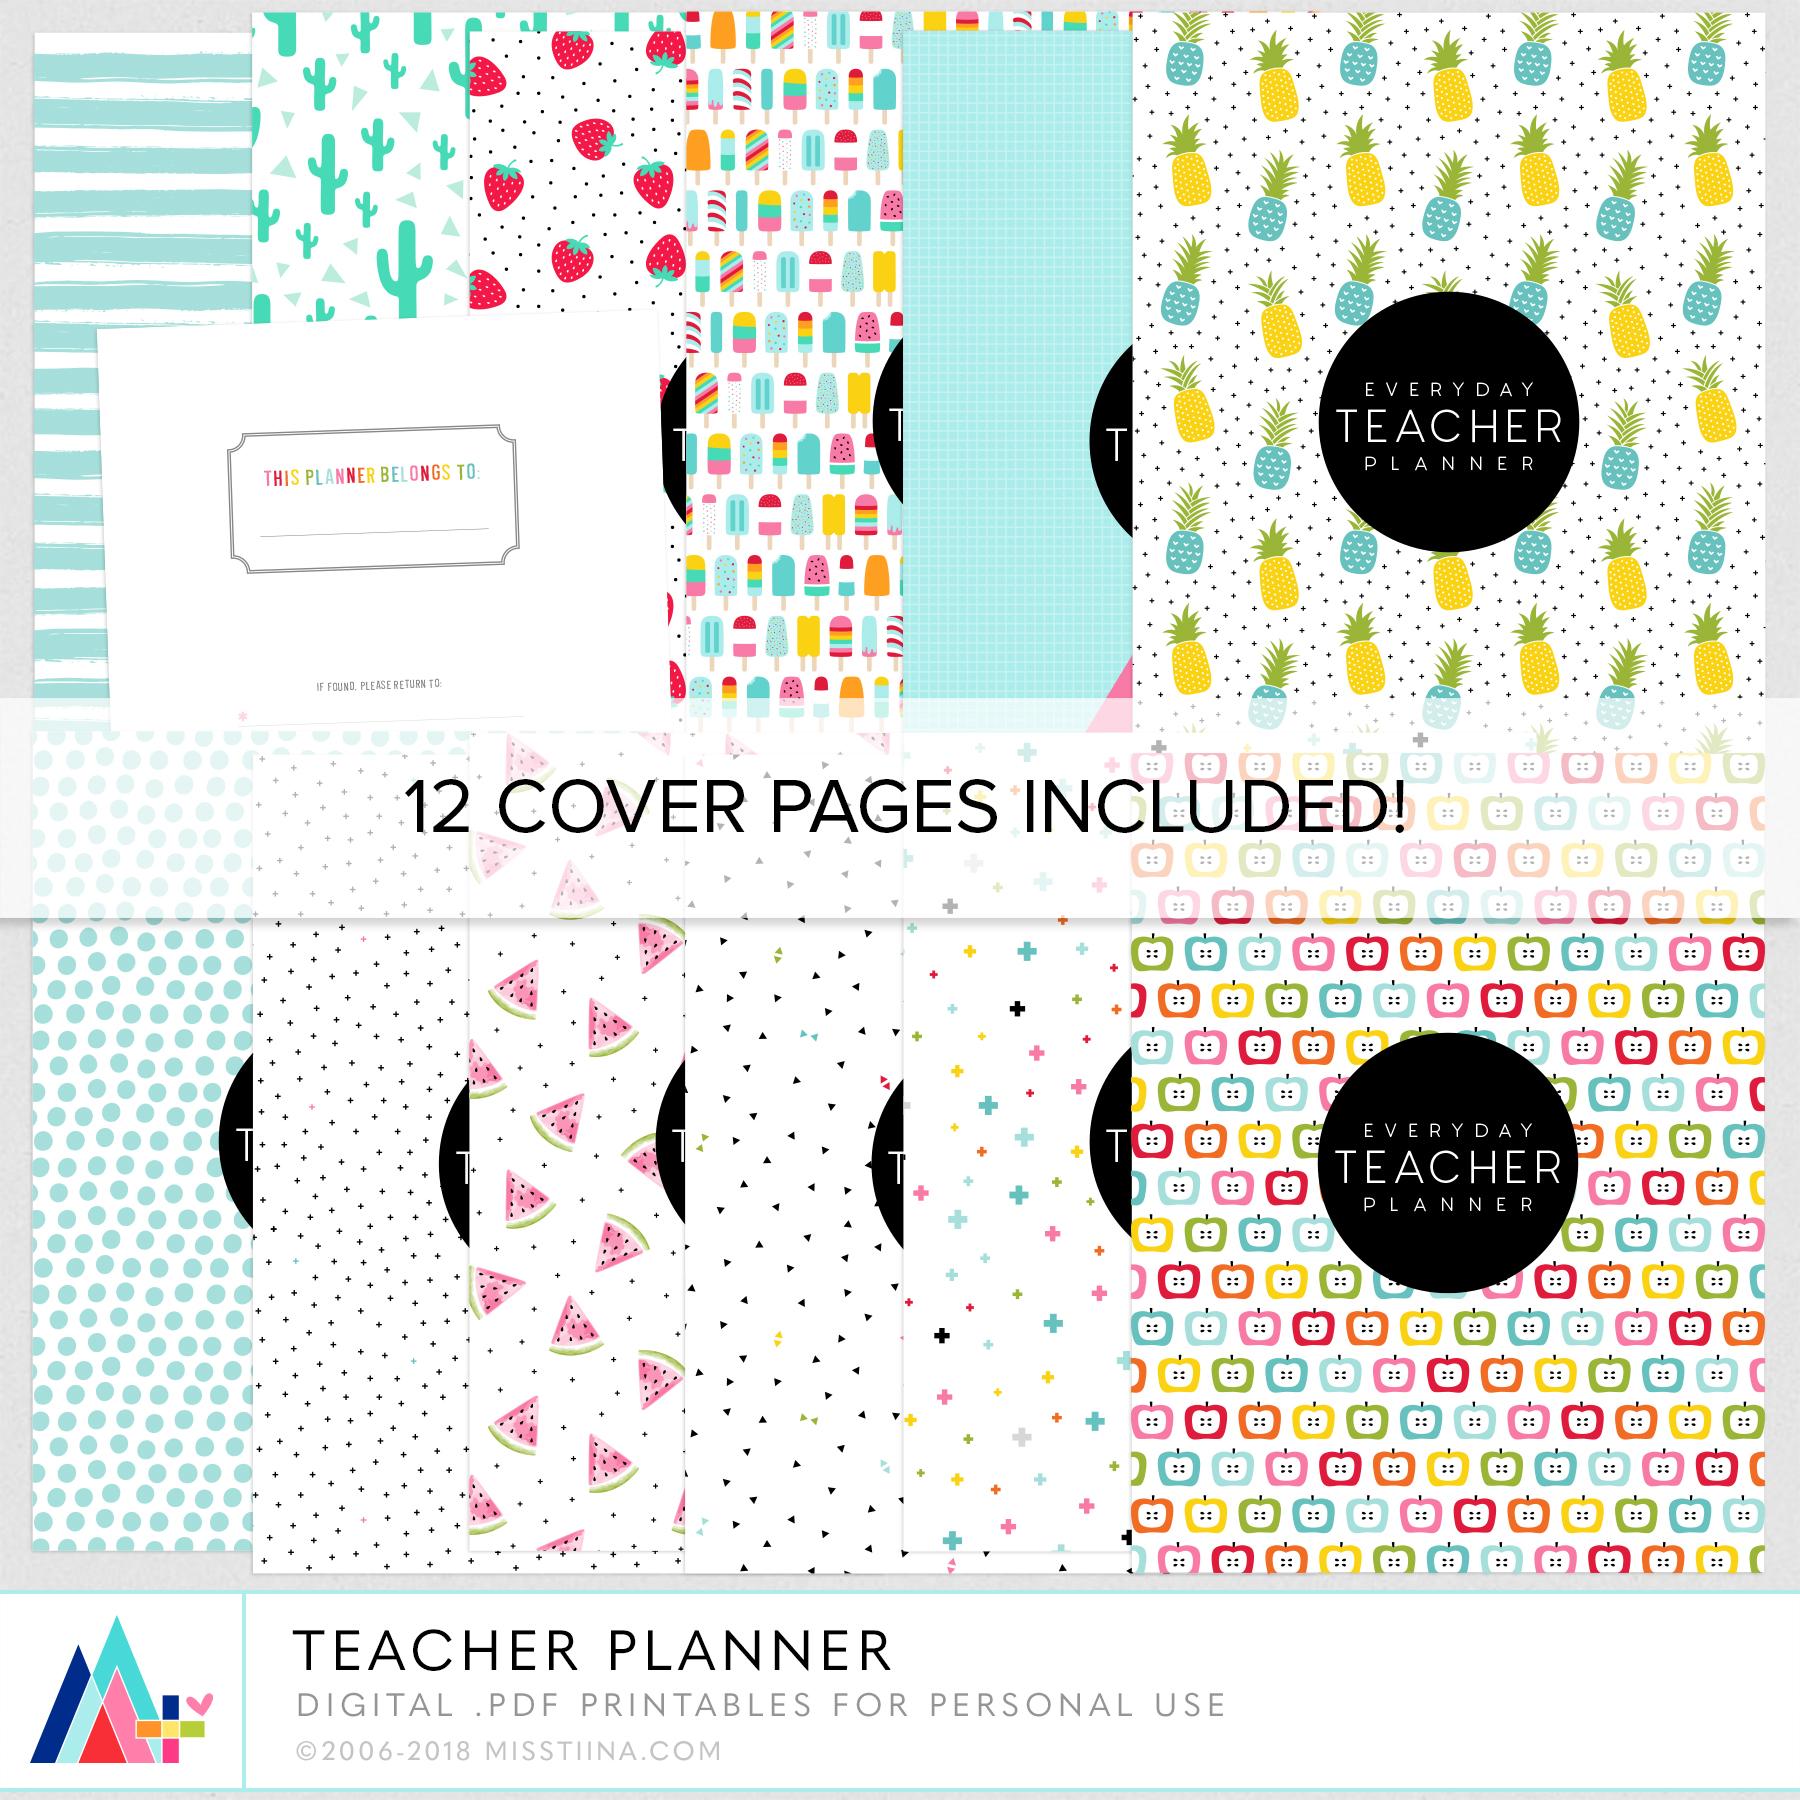 Teacher Planner 3 NEW Printable Freebies